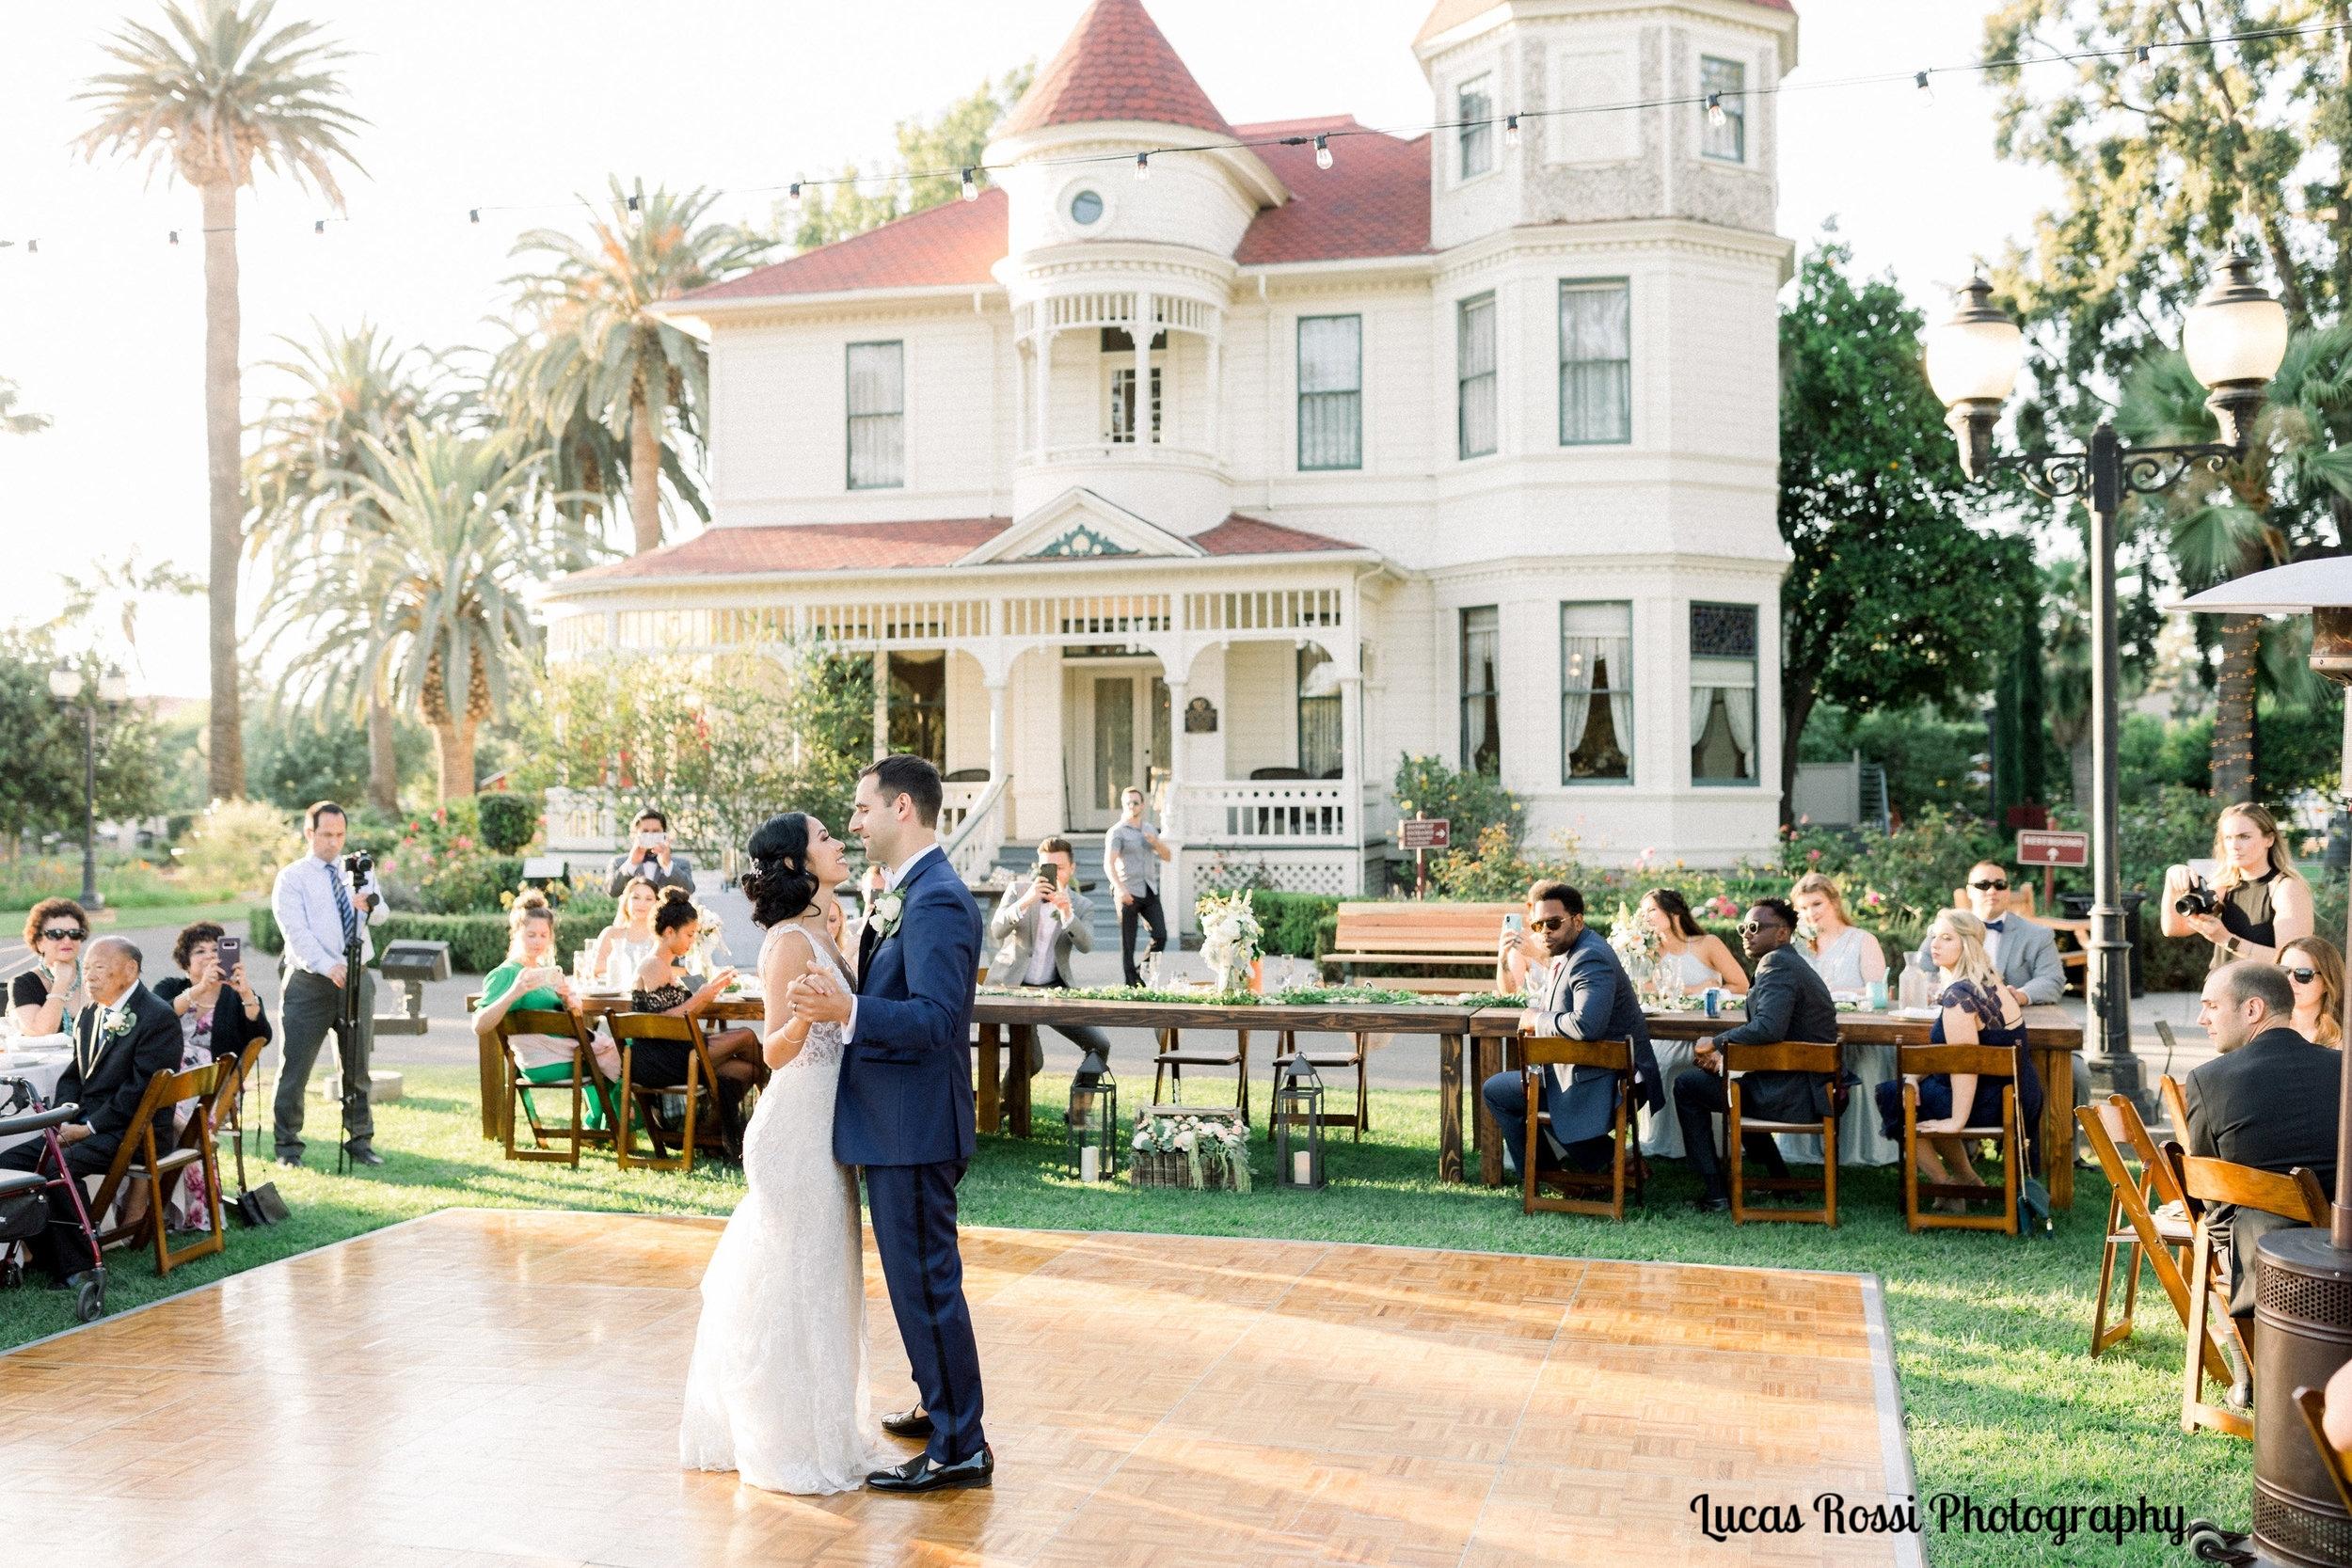 Wedding Catering in Santa Barbara, CA